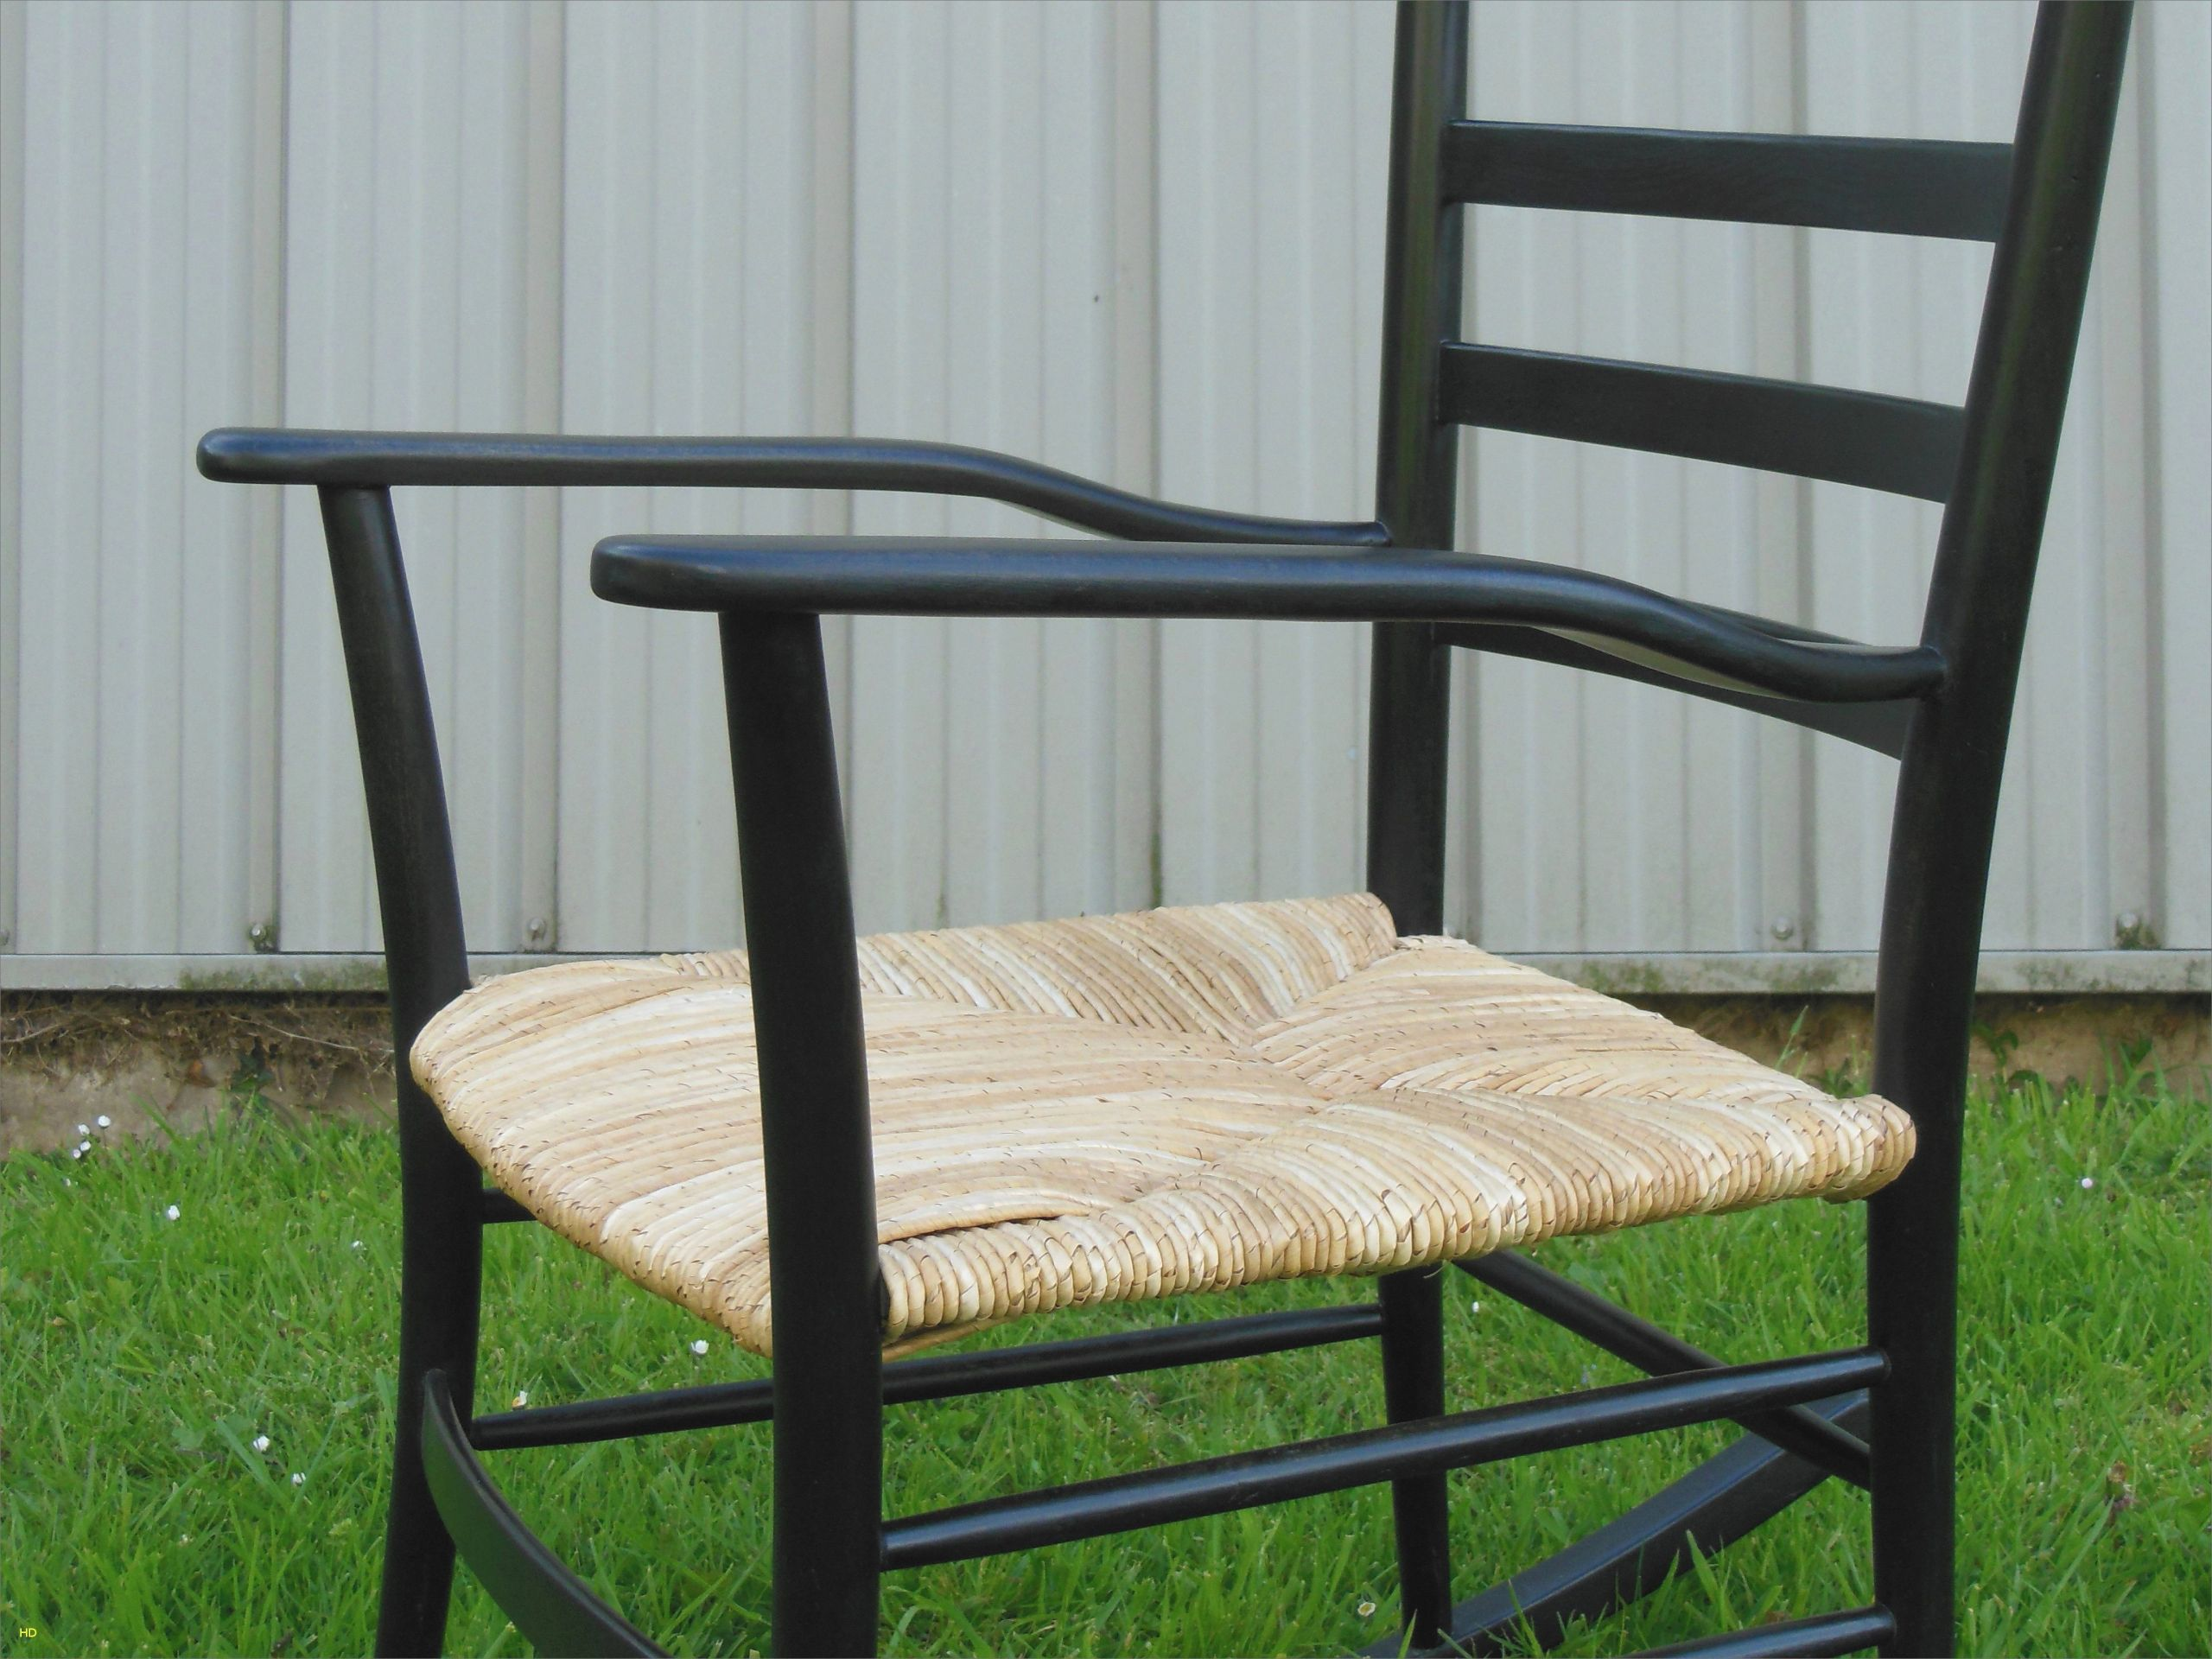 Chaises Alinea Salle A Manger chaise de jardin aluminium luxe 77 génial table jardin